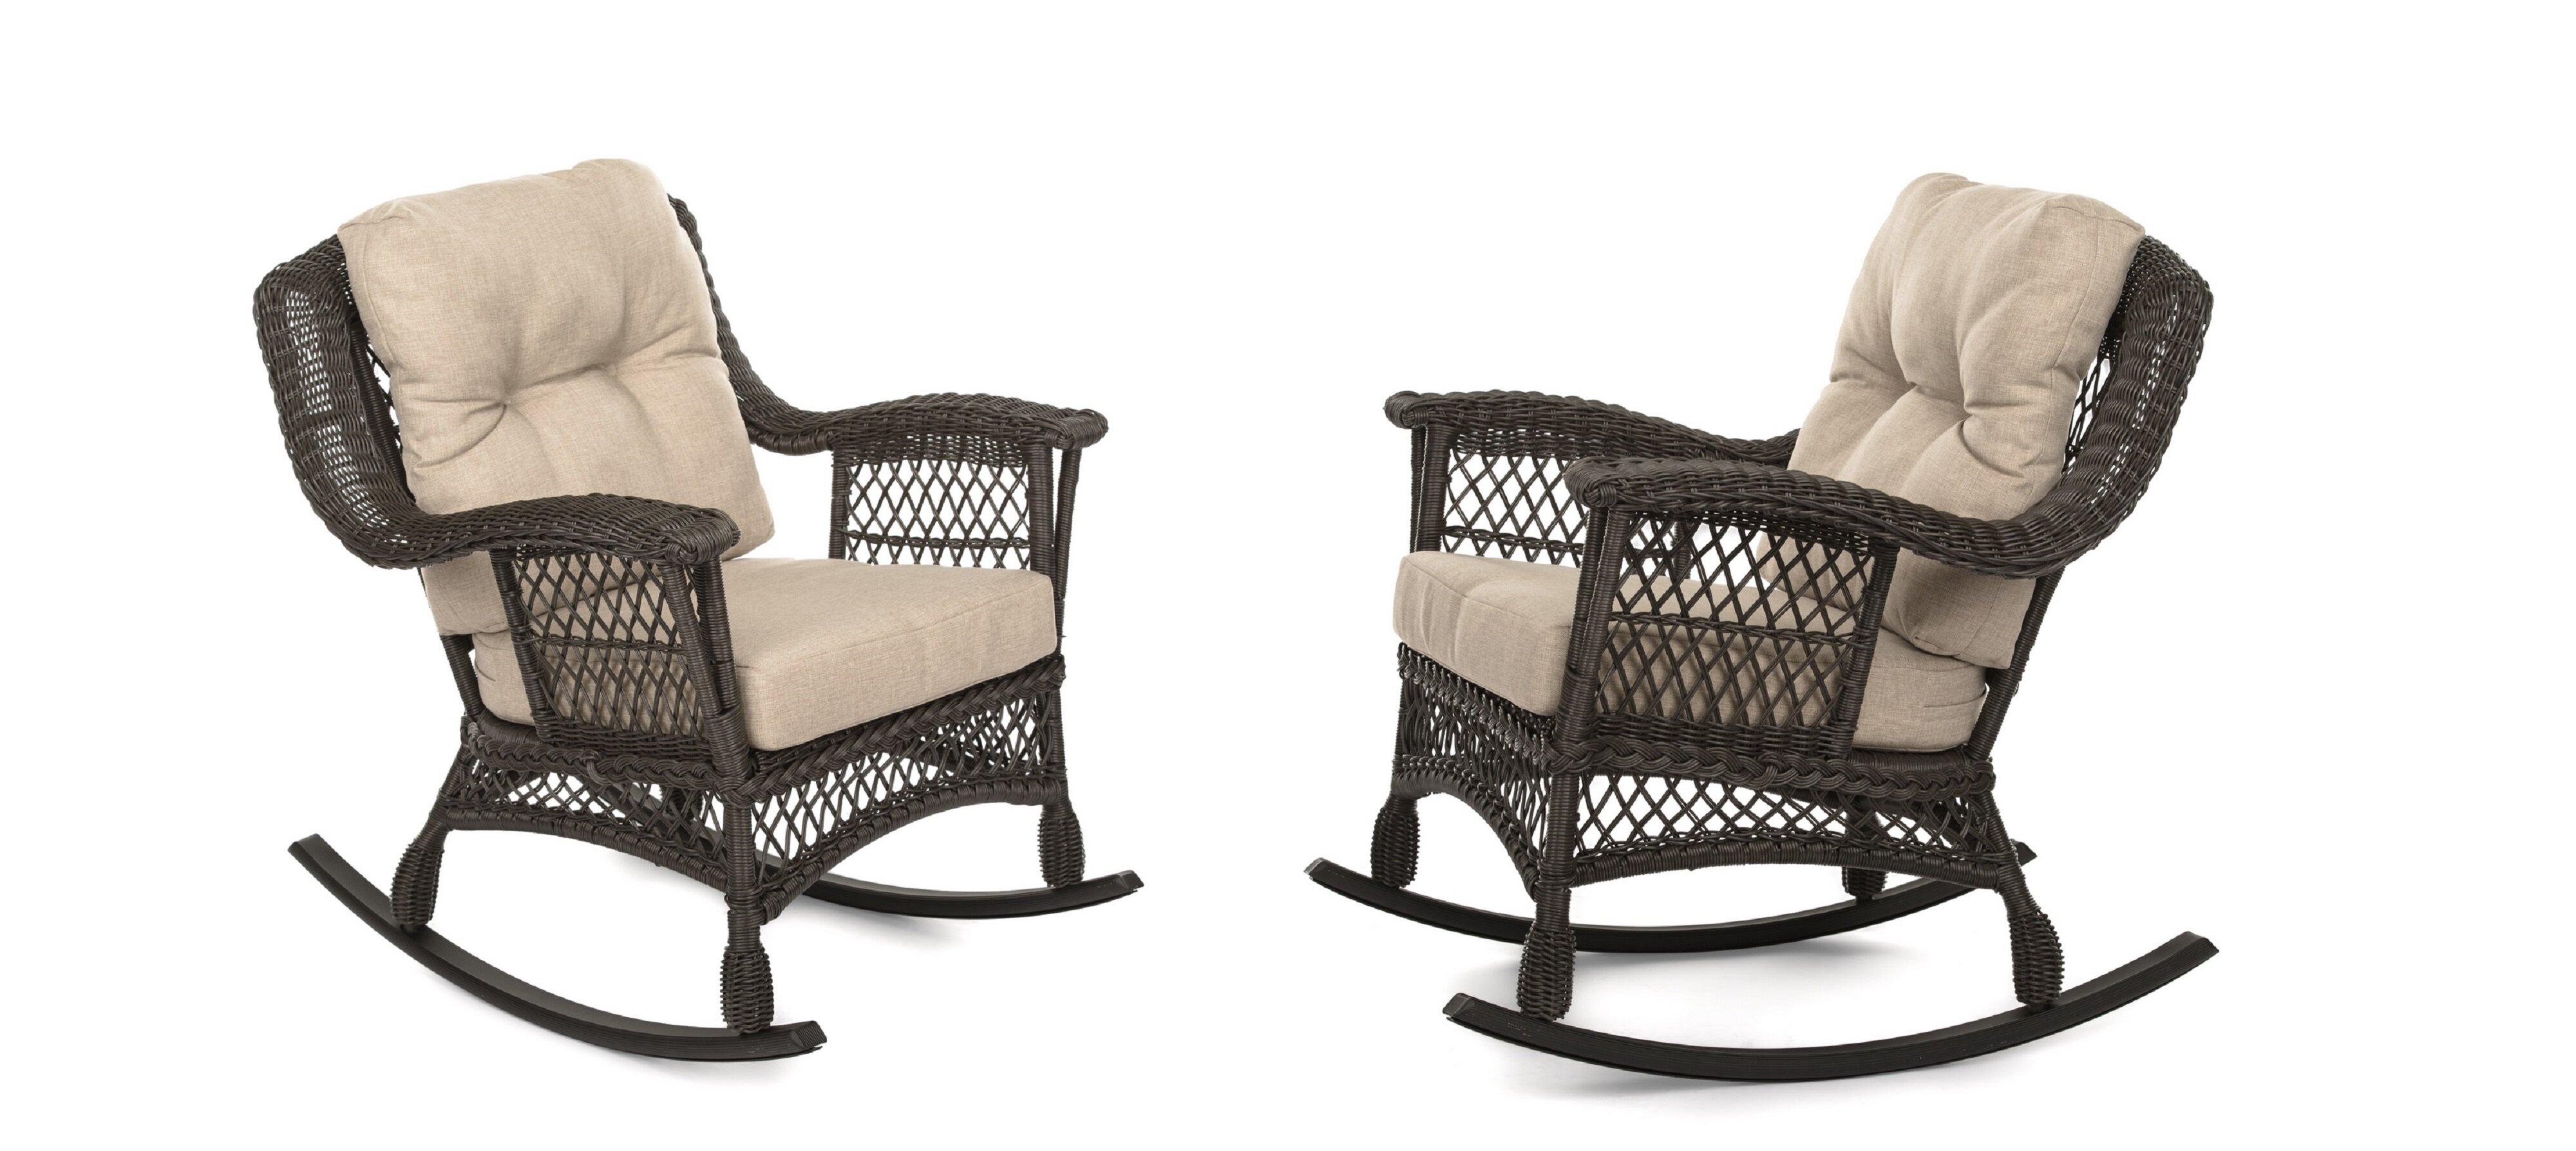 Demps Outdoor Garden Rocking Chair